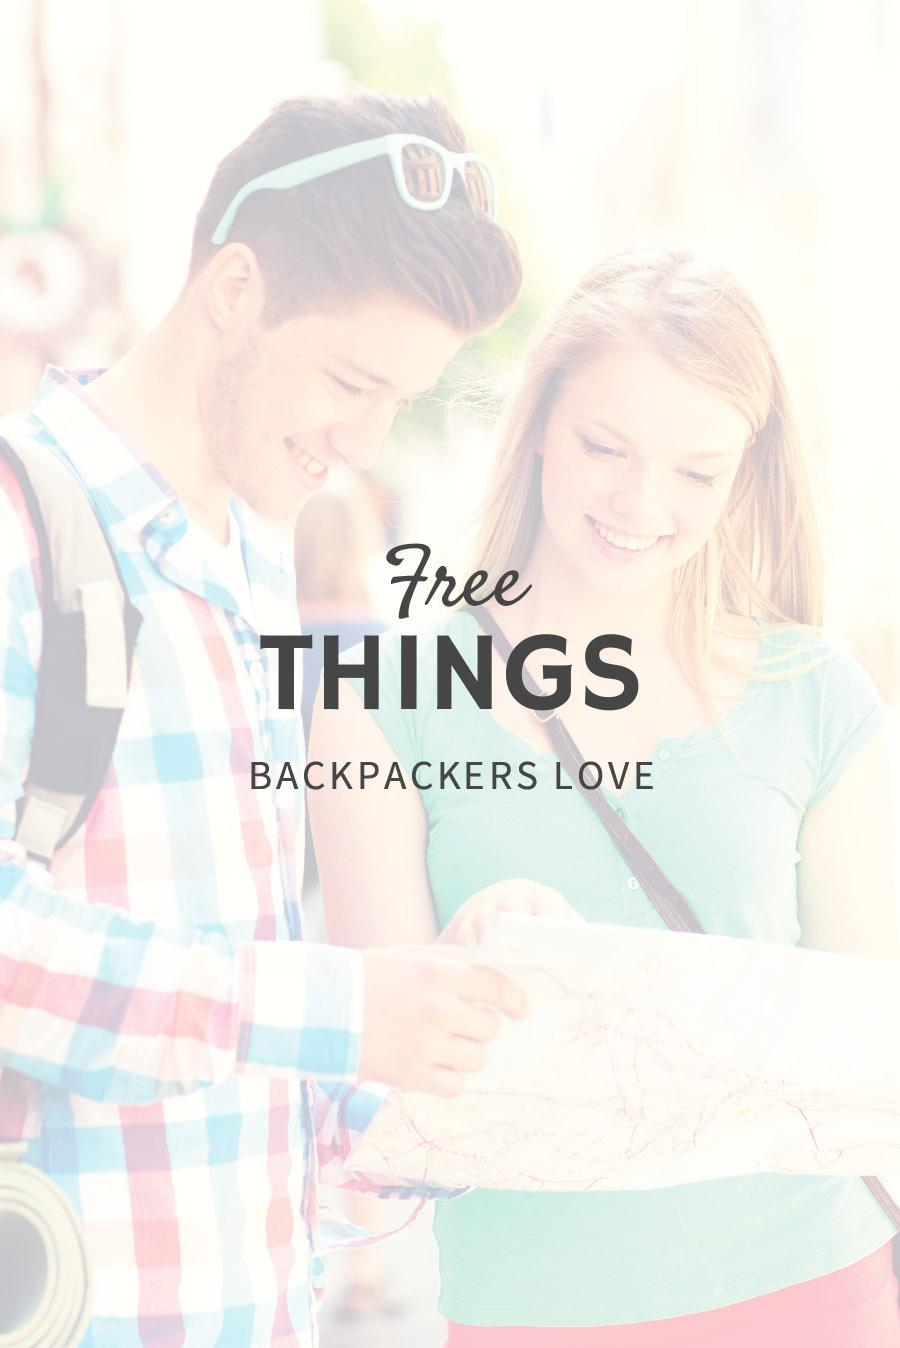 Free Things Backpackers Love